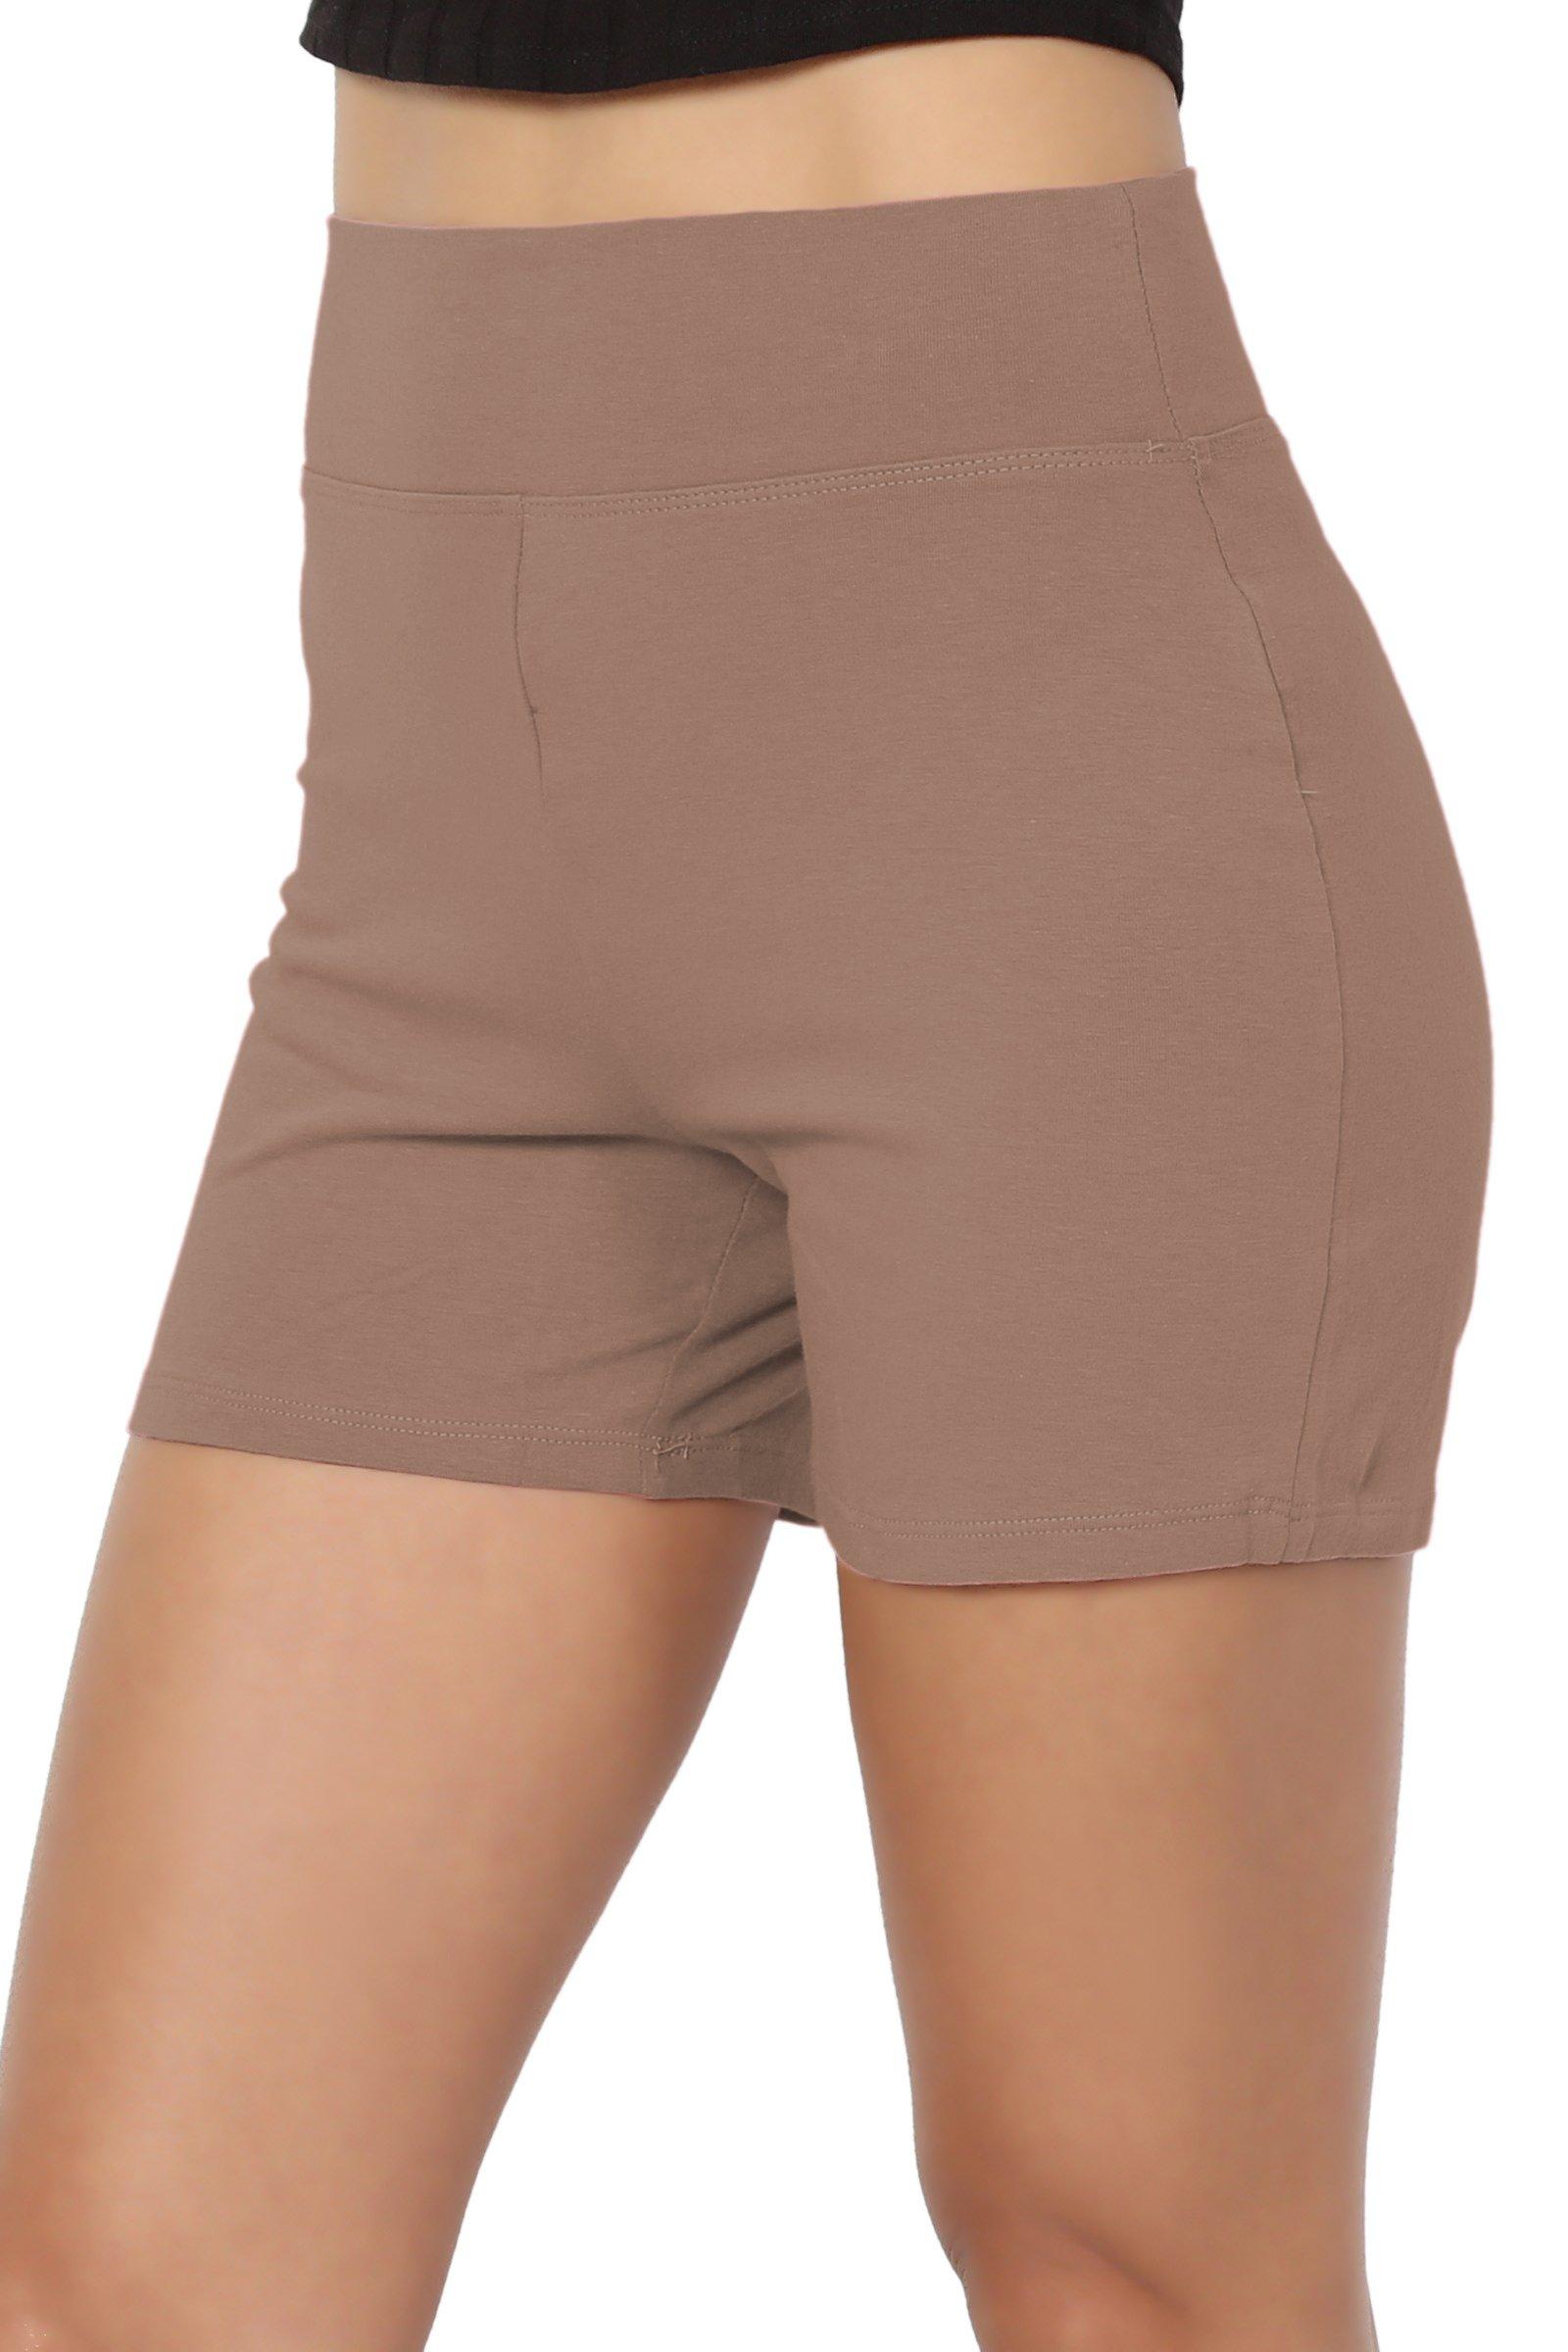 27ddee0df72d4e TheMogan Women's Cotton Span High Waist Under Short Yoga Leggings Mocha 3XL